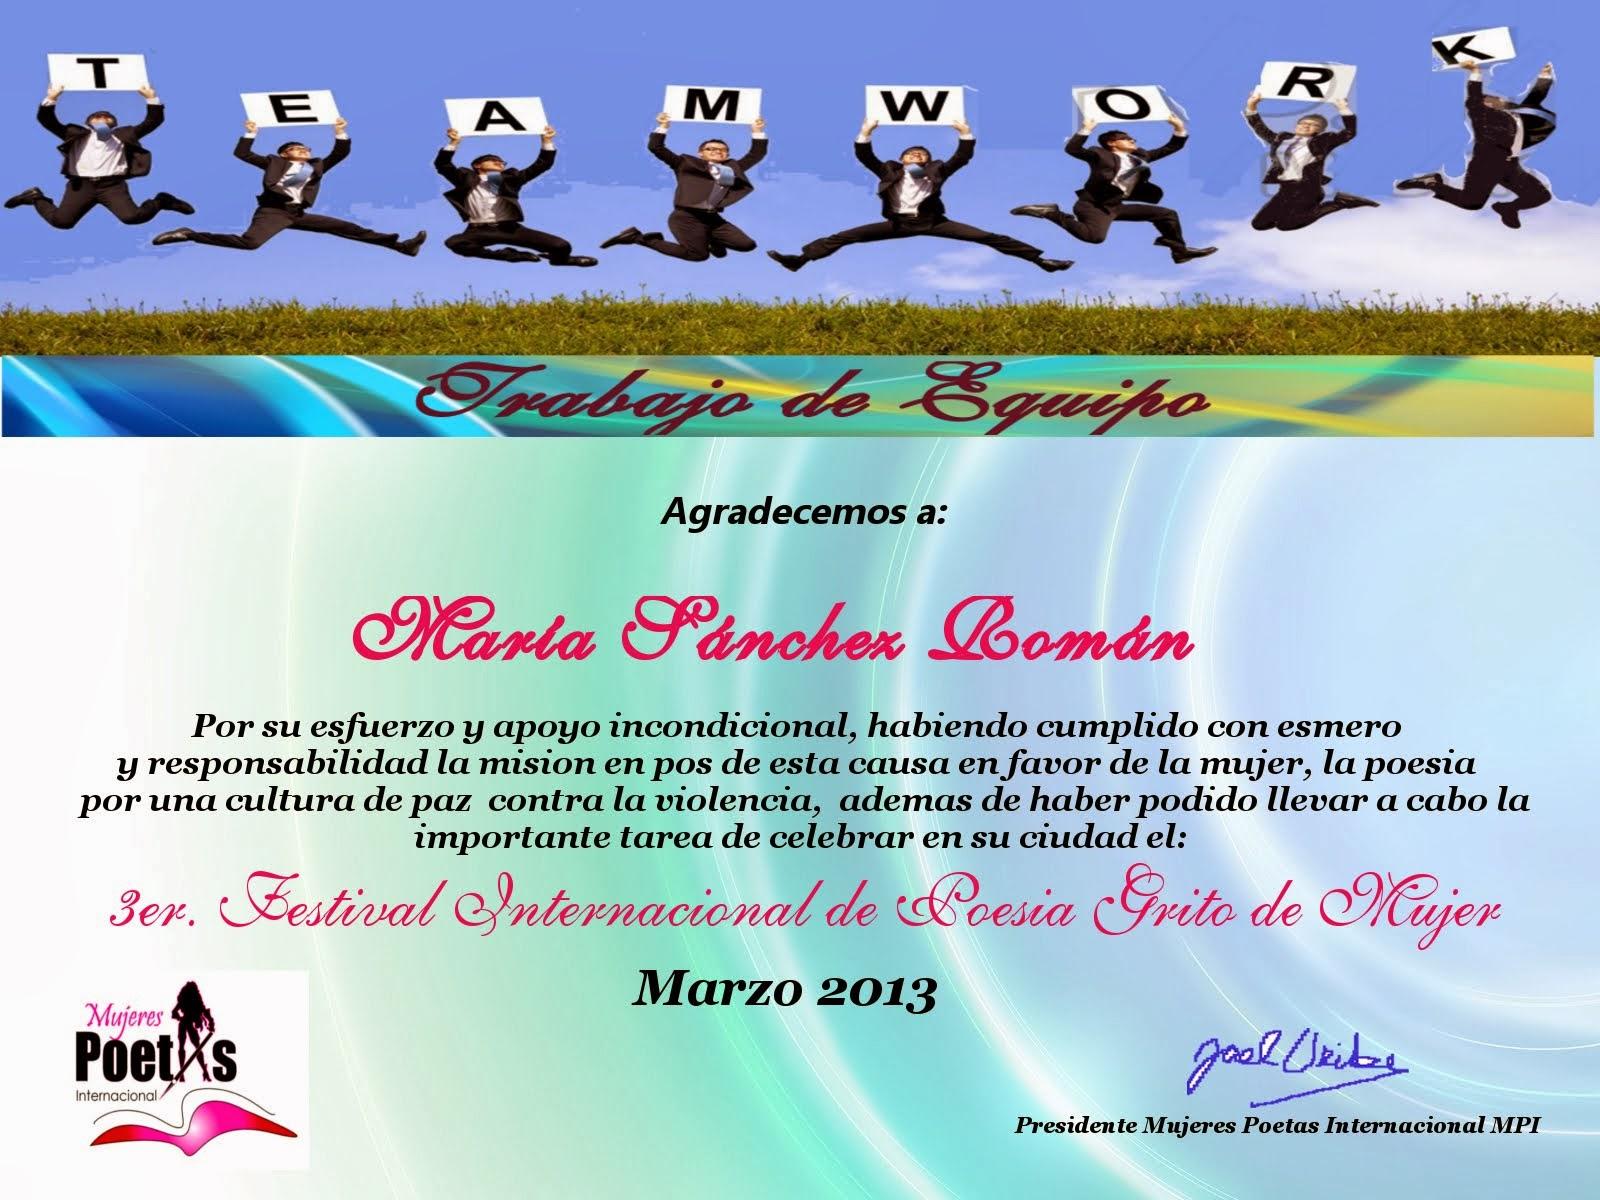 Diploma otorgado por Mujeres Poetas Internacional